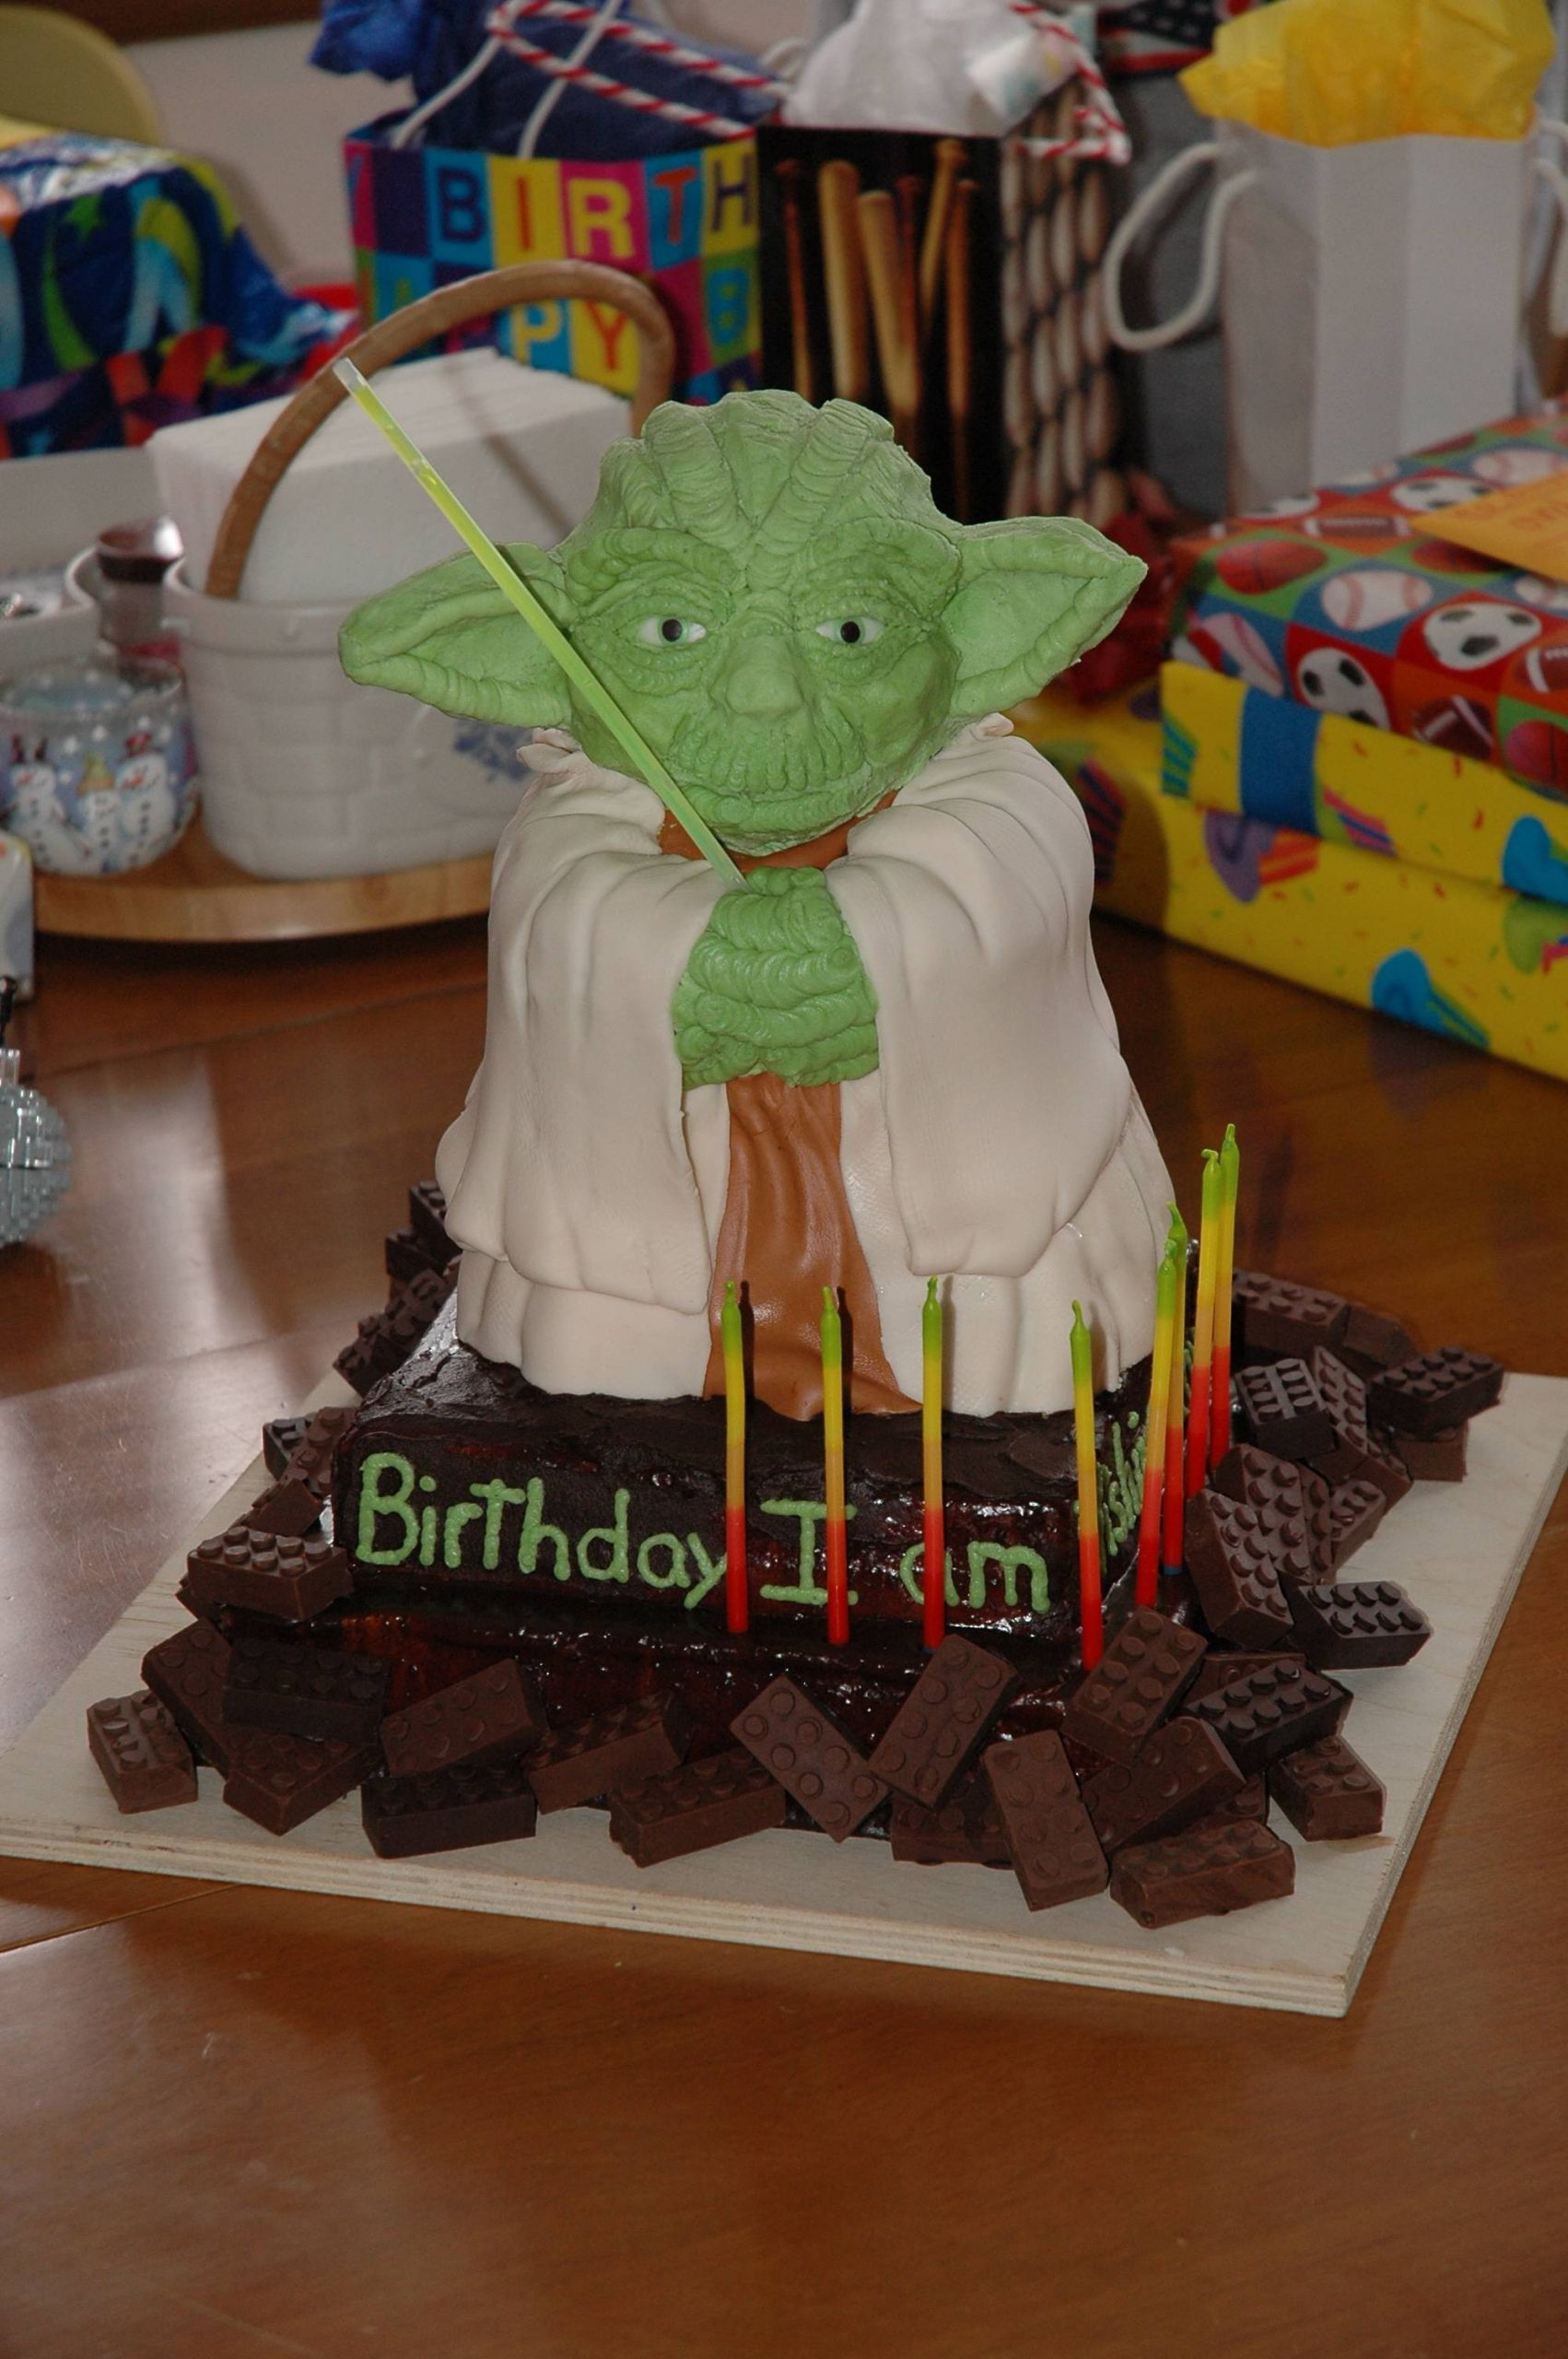 Yoda Birthday Cake  Master Yoda Birthday Cake [geekPicture]